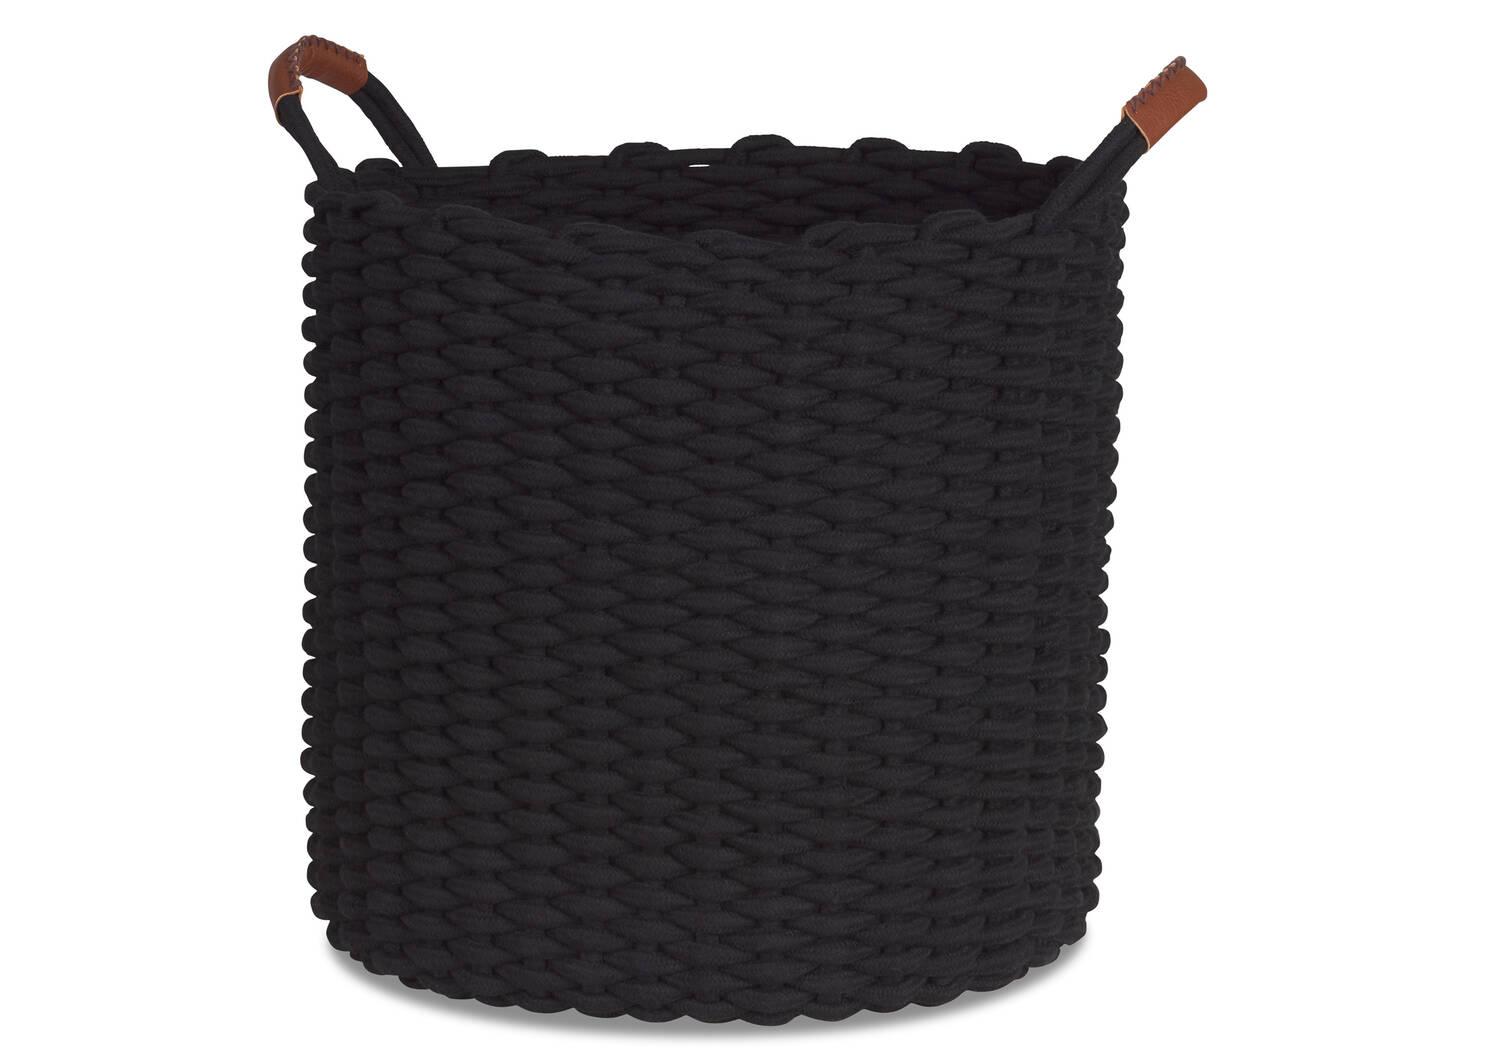 Corde Laundry Basket Black